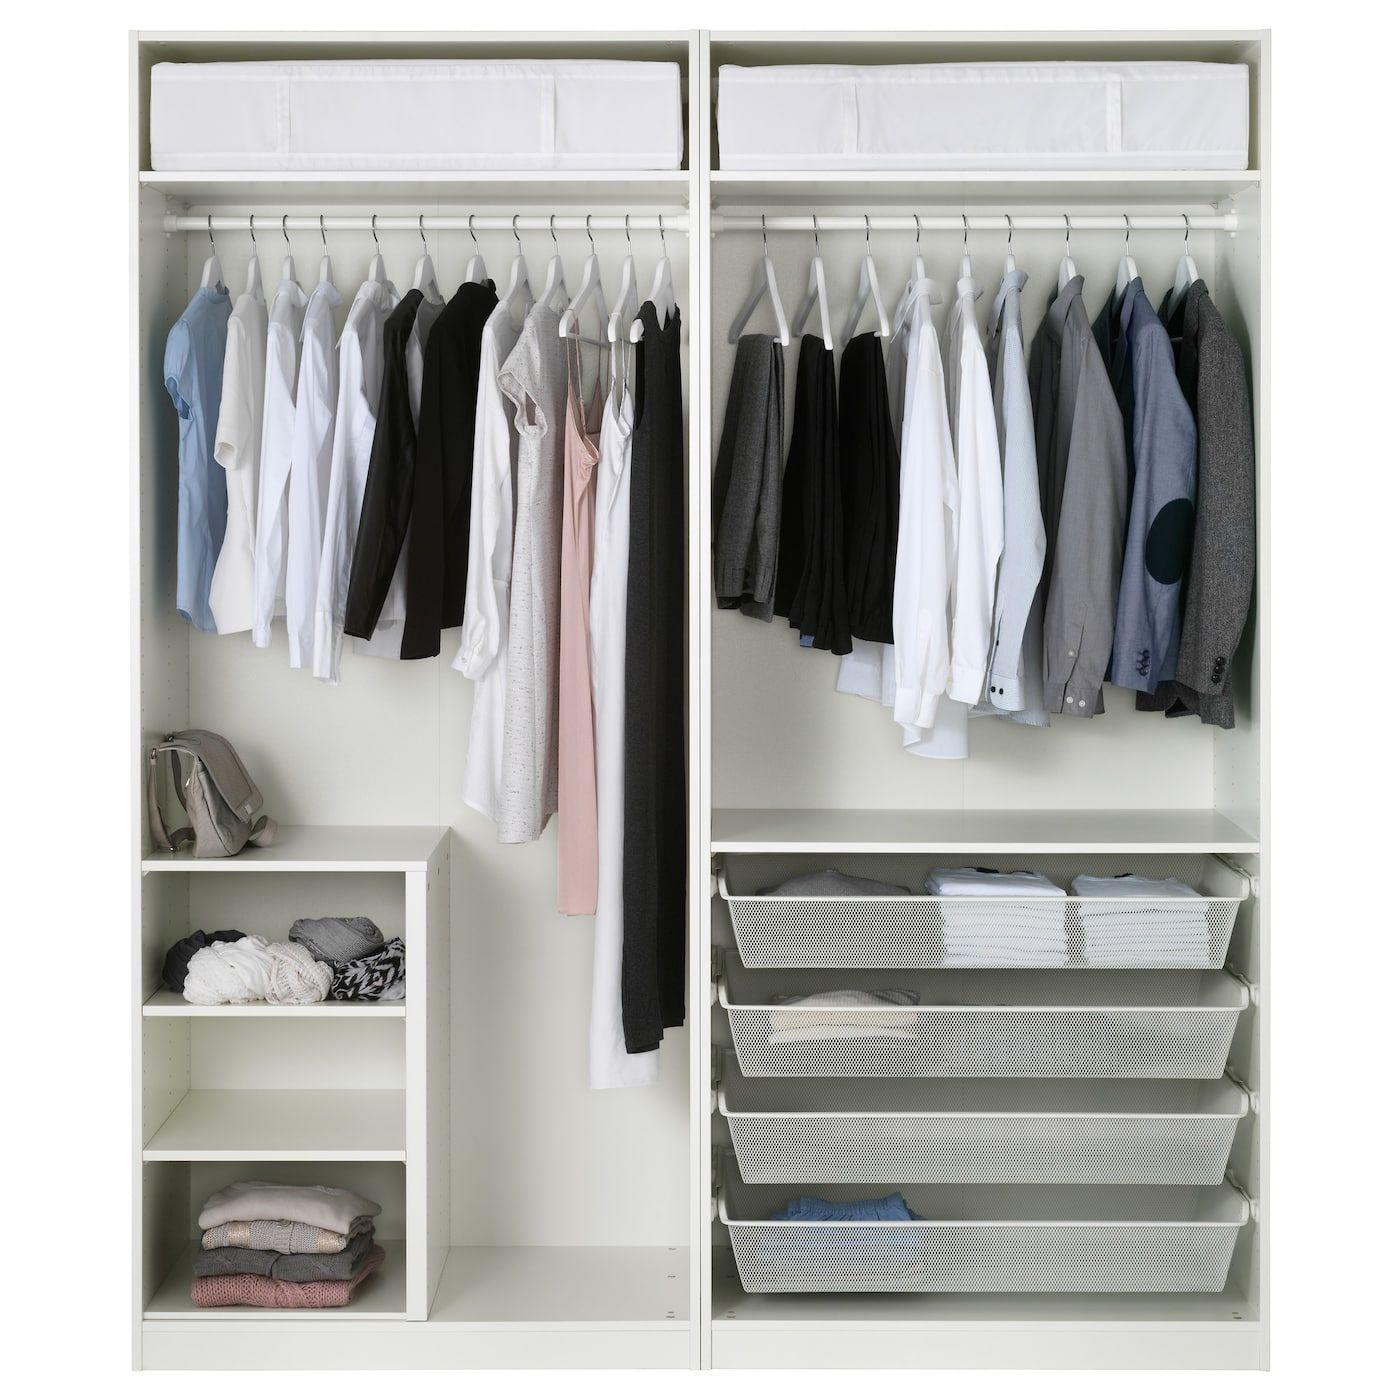 Wardrobe White Bergsbo White 78 3 4x23 5 8x93 1 8 Pax